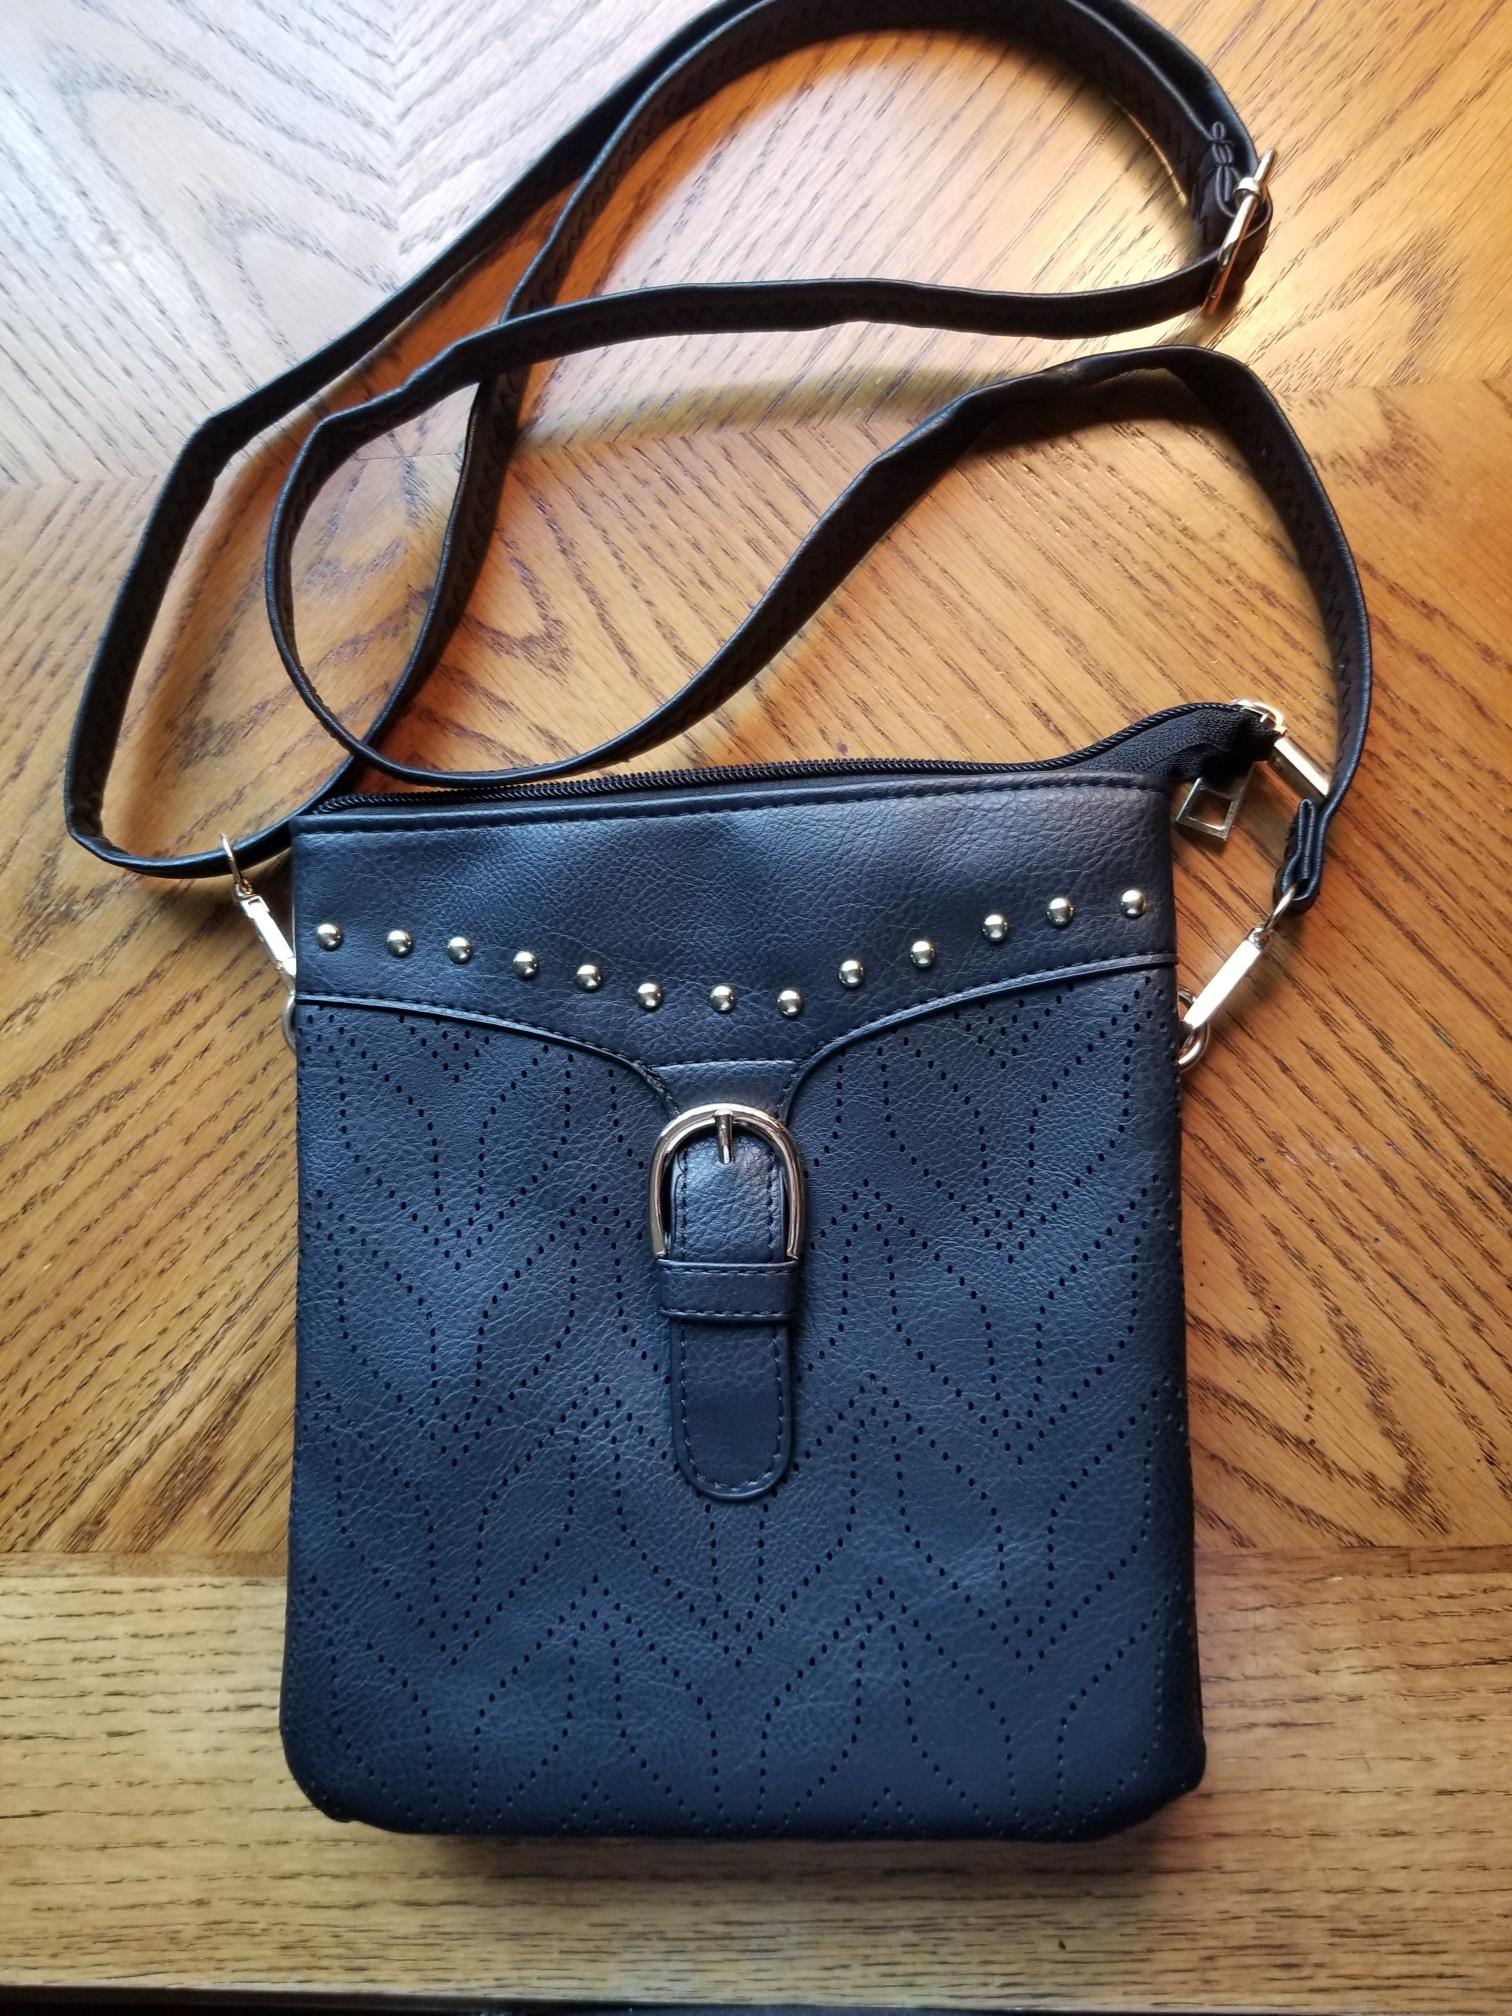 COMPACT SHOULDER-STRAP WOMEN'S CELLPHONE BAG